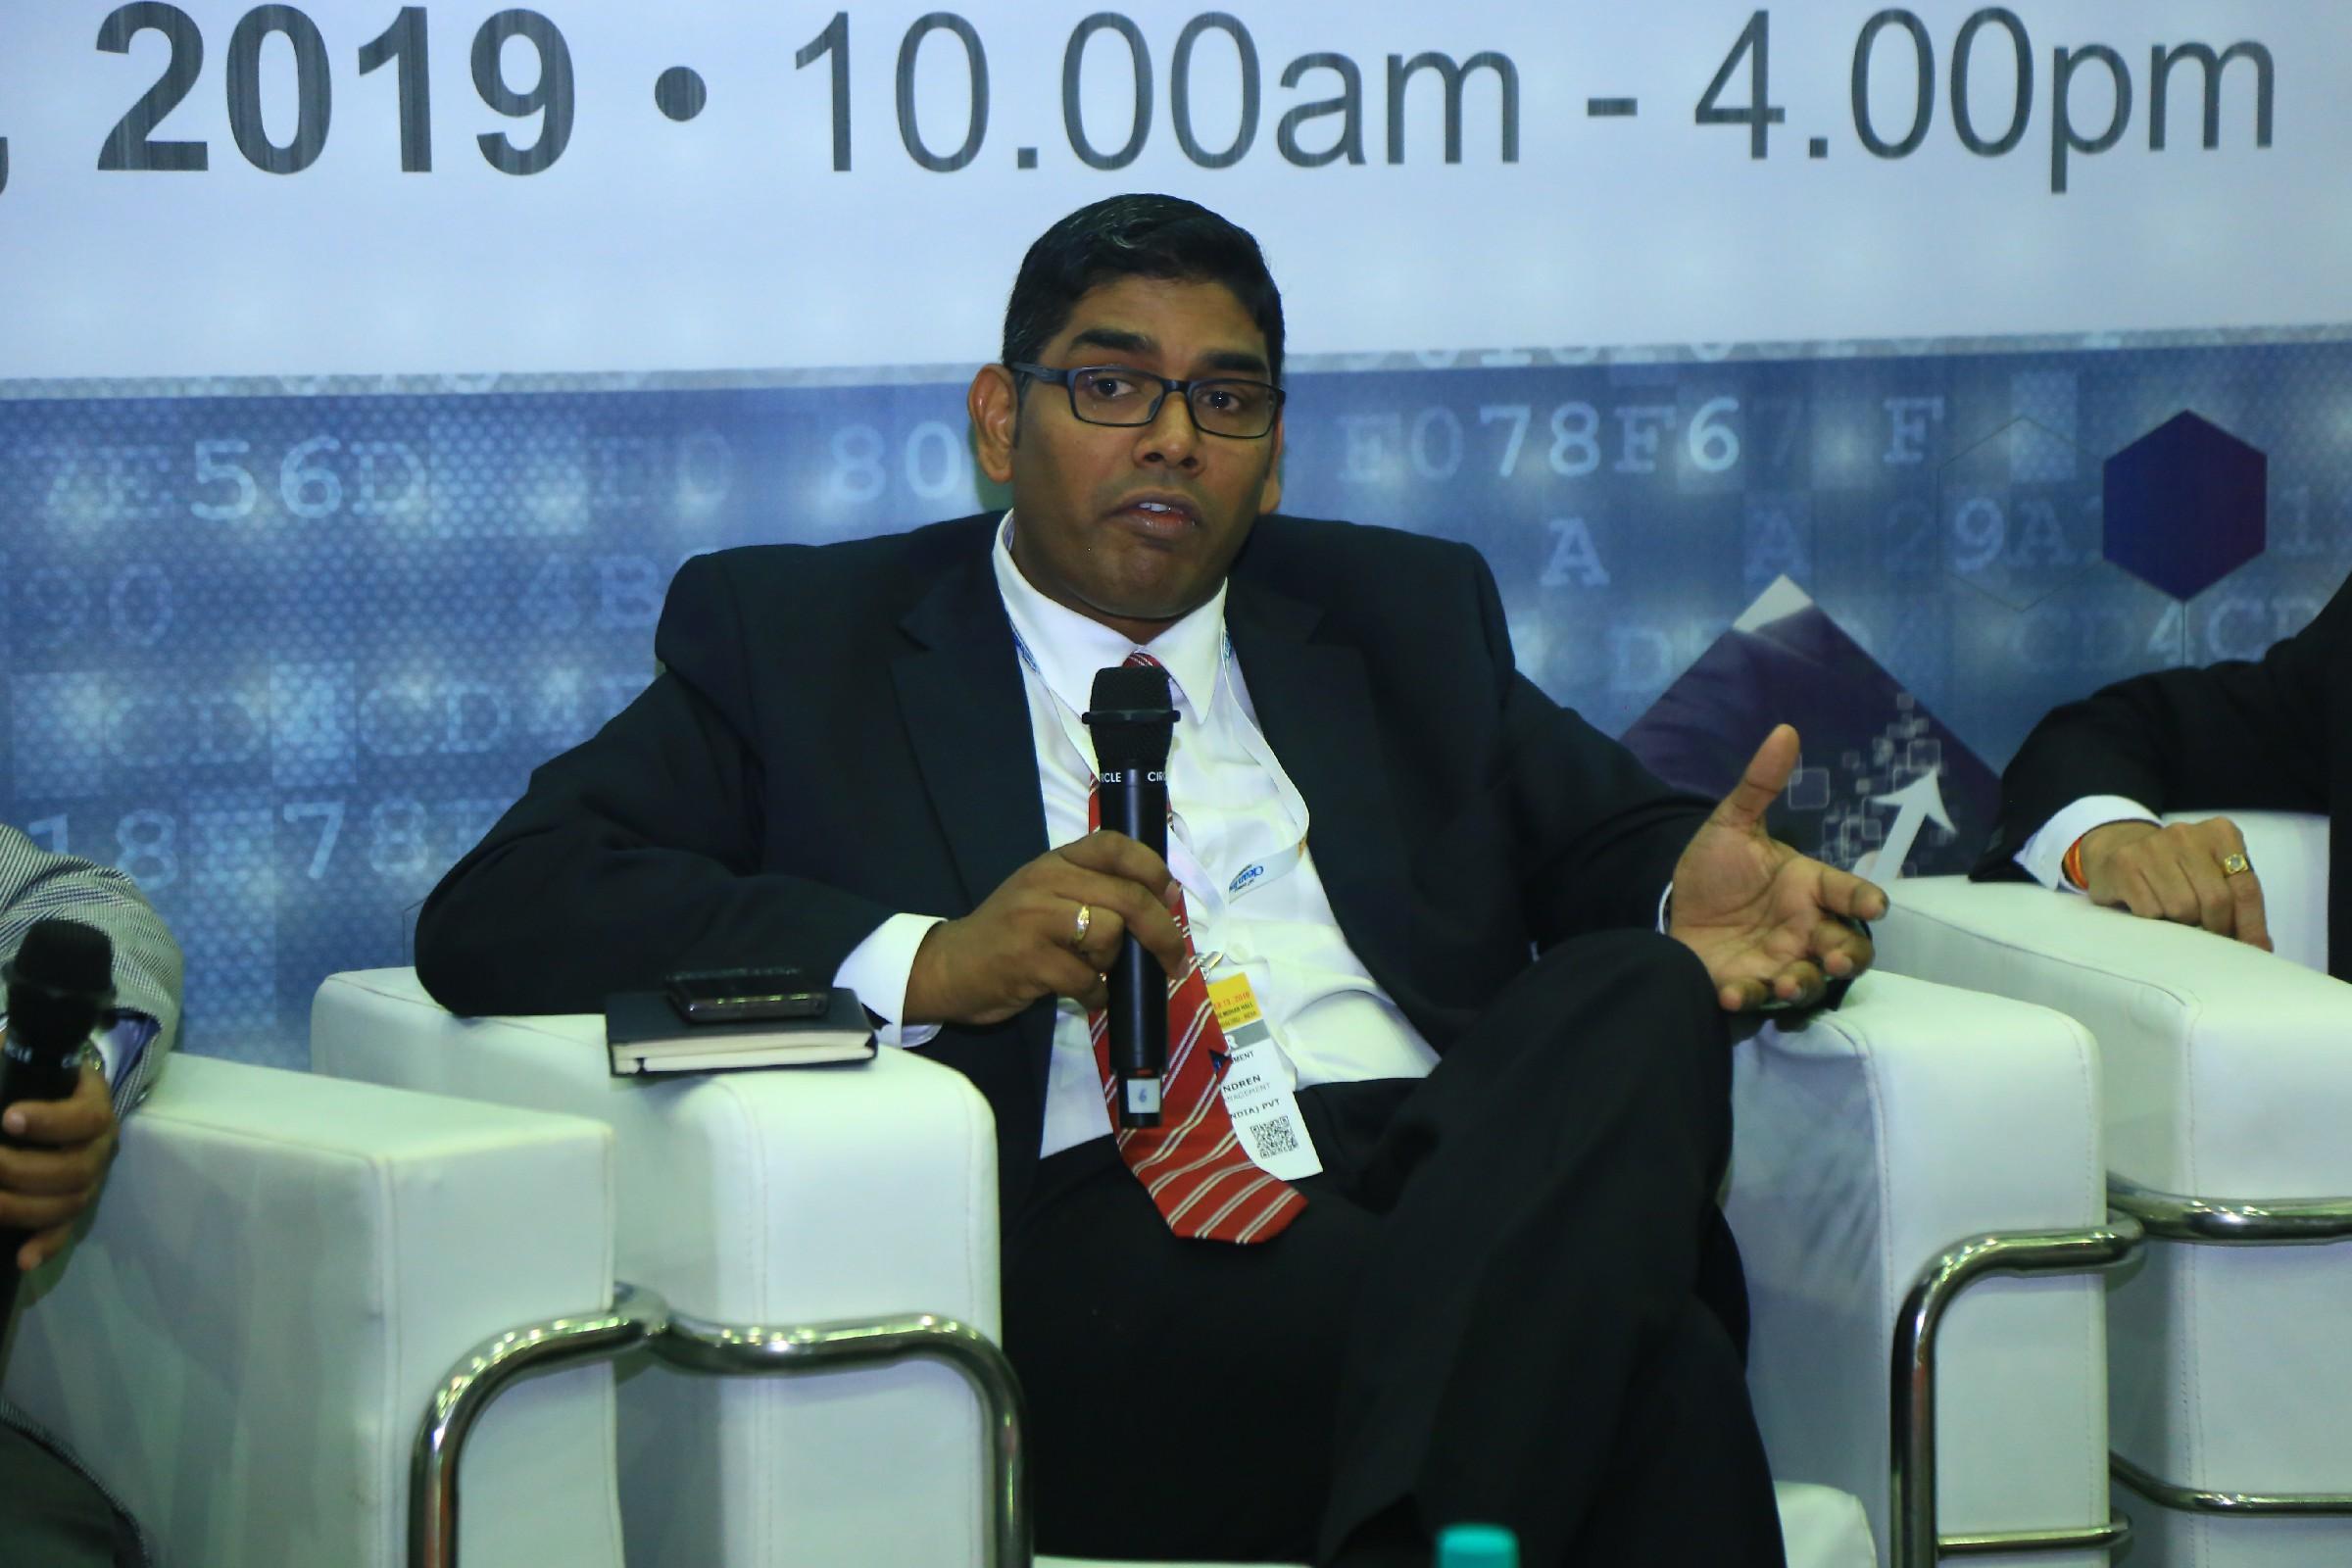 Sathish-Rajendren-COO-Facilities-Management-Services-Knight-Frank-India-Pvt.-Ltd-4